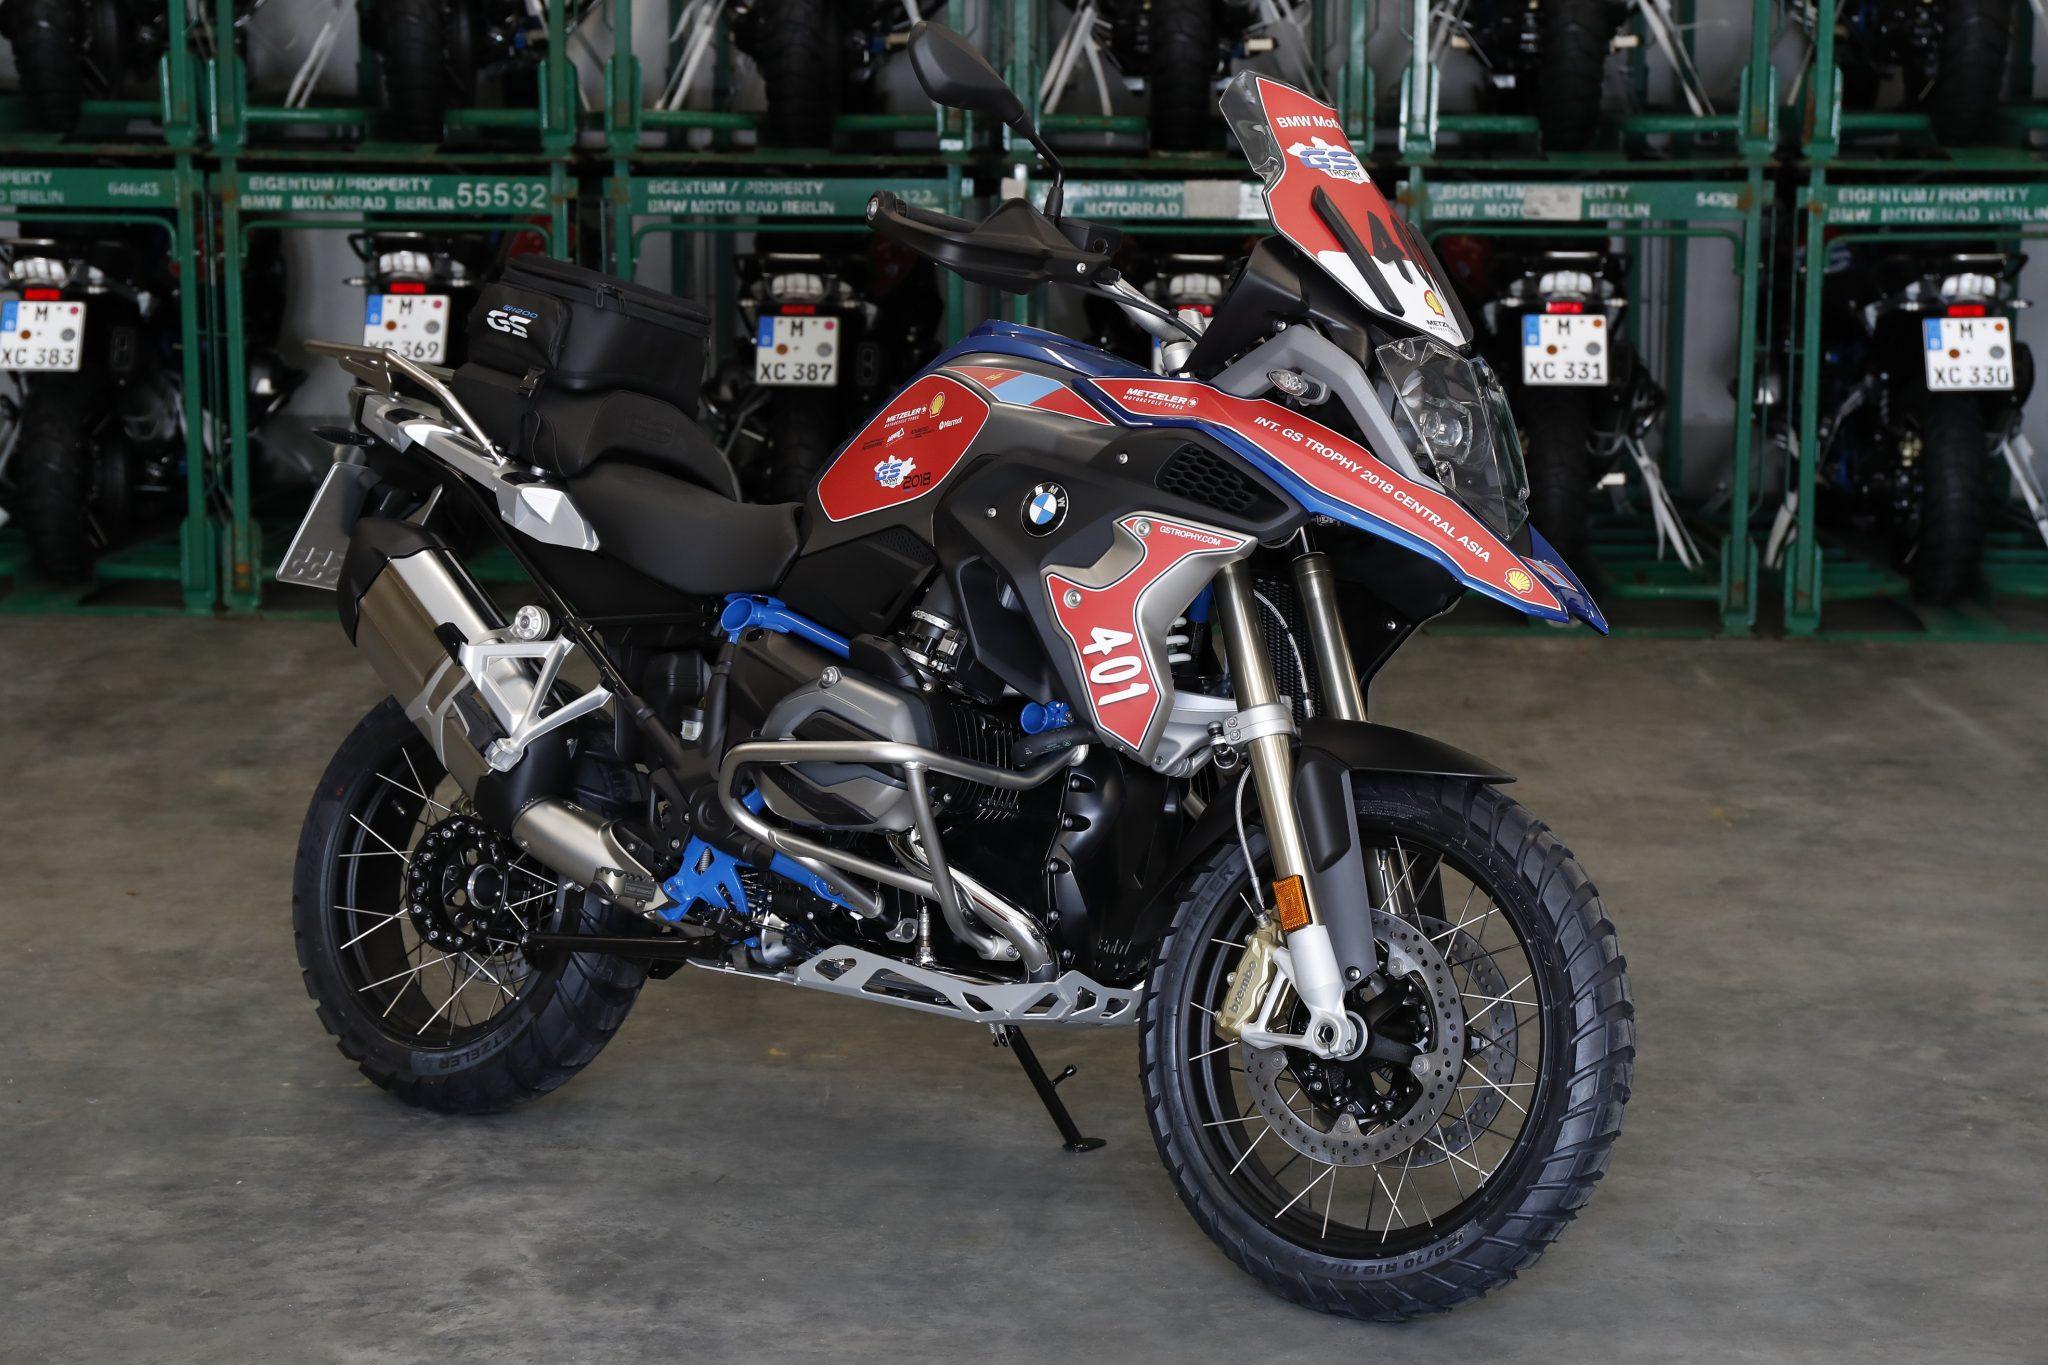 BMW Motorrad International GS Trophy bikes ready for action!